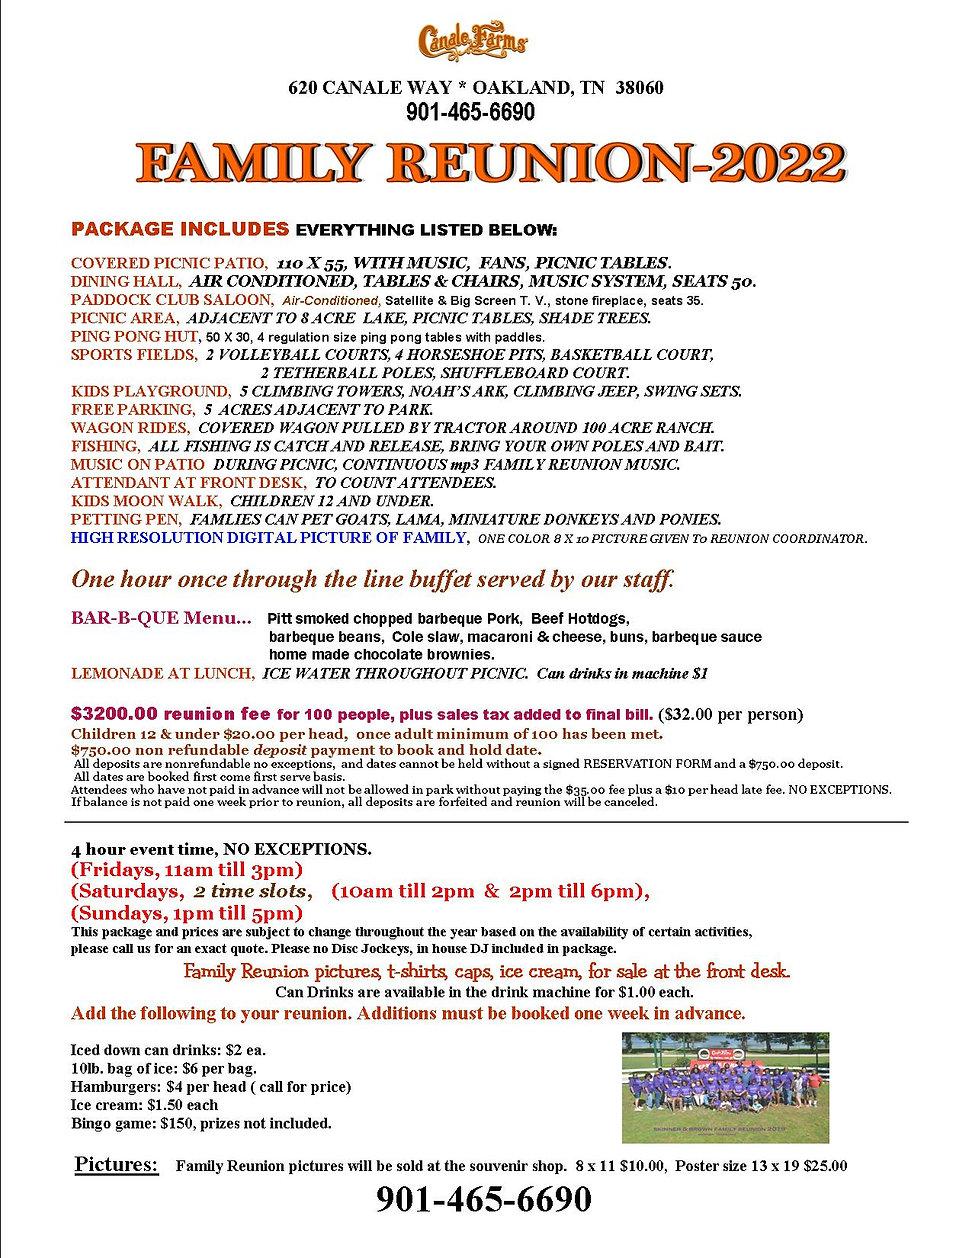 FAMILY RUNION PACKGAE 2022a.jpg